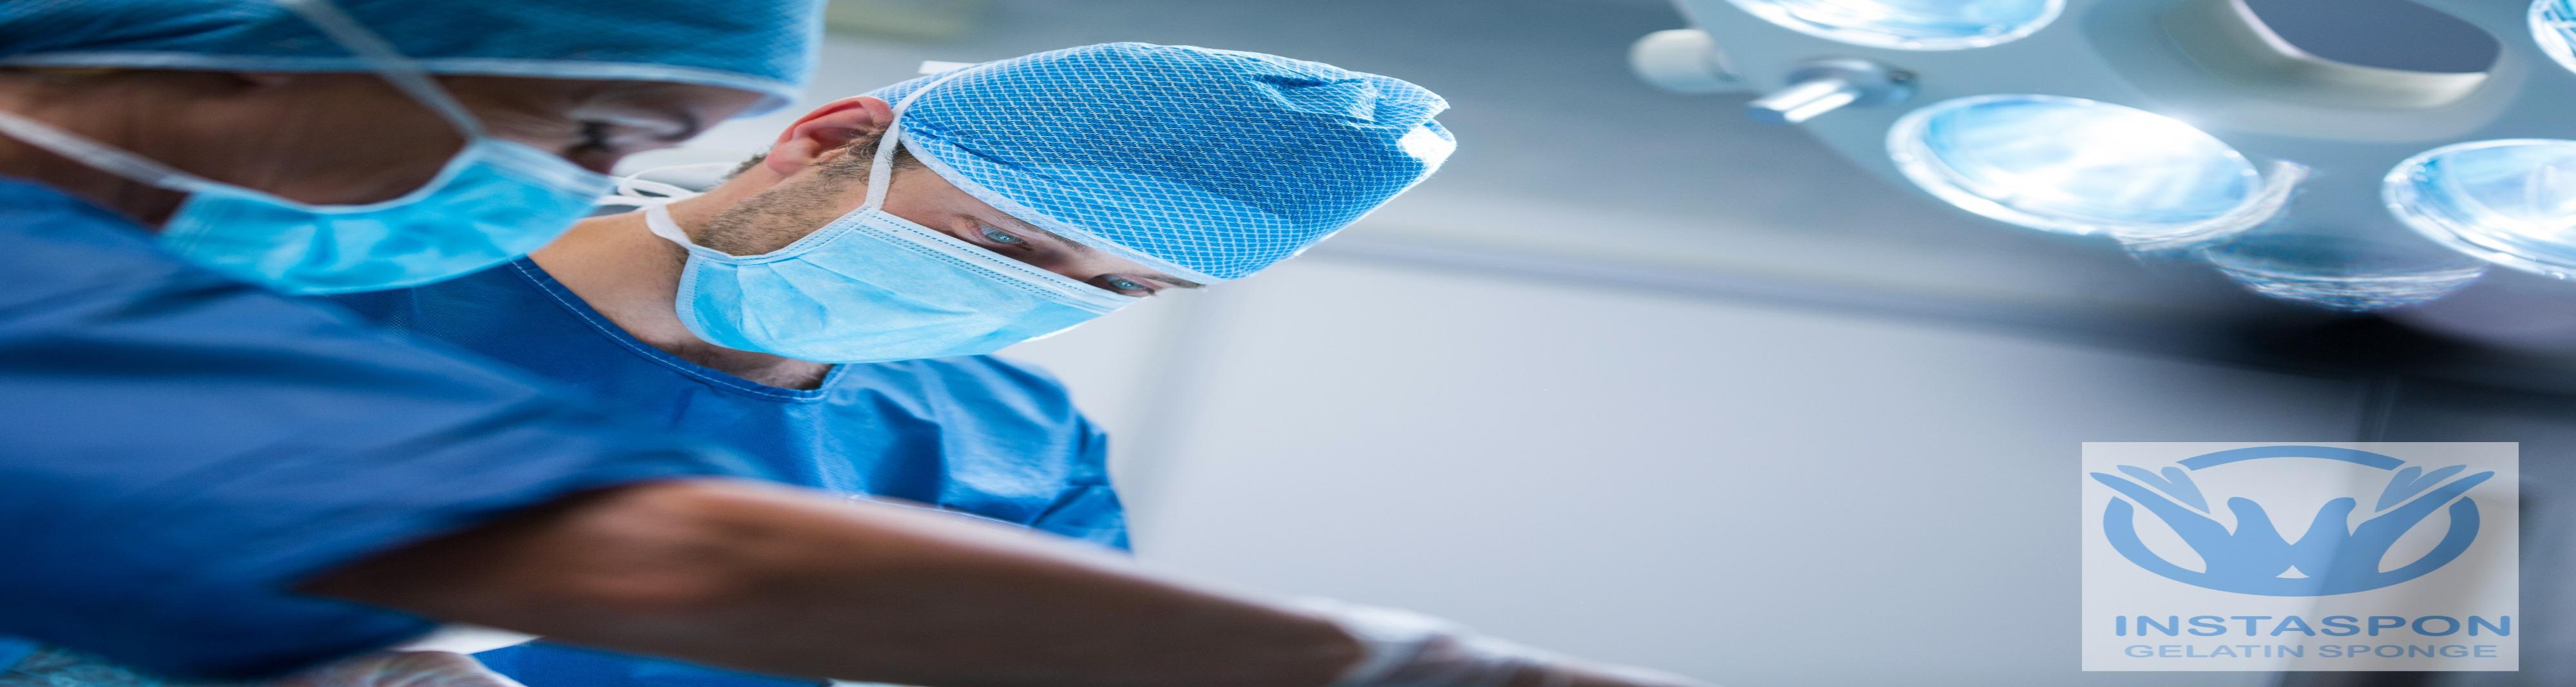 surgical hemostat collagen sponge blood stop chitosan sponge dental sponge